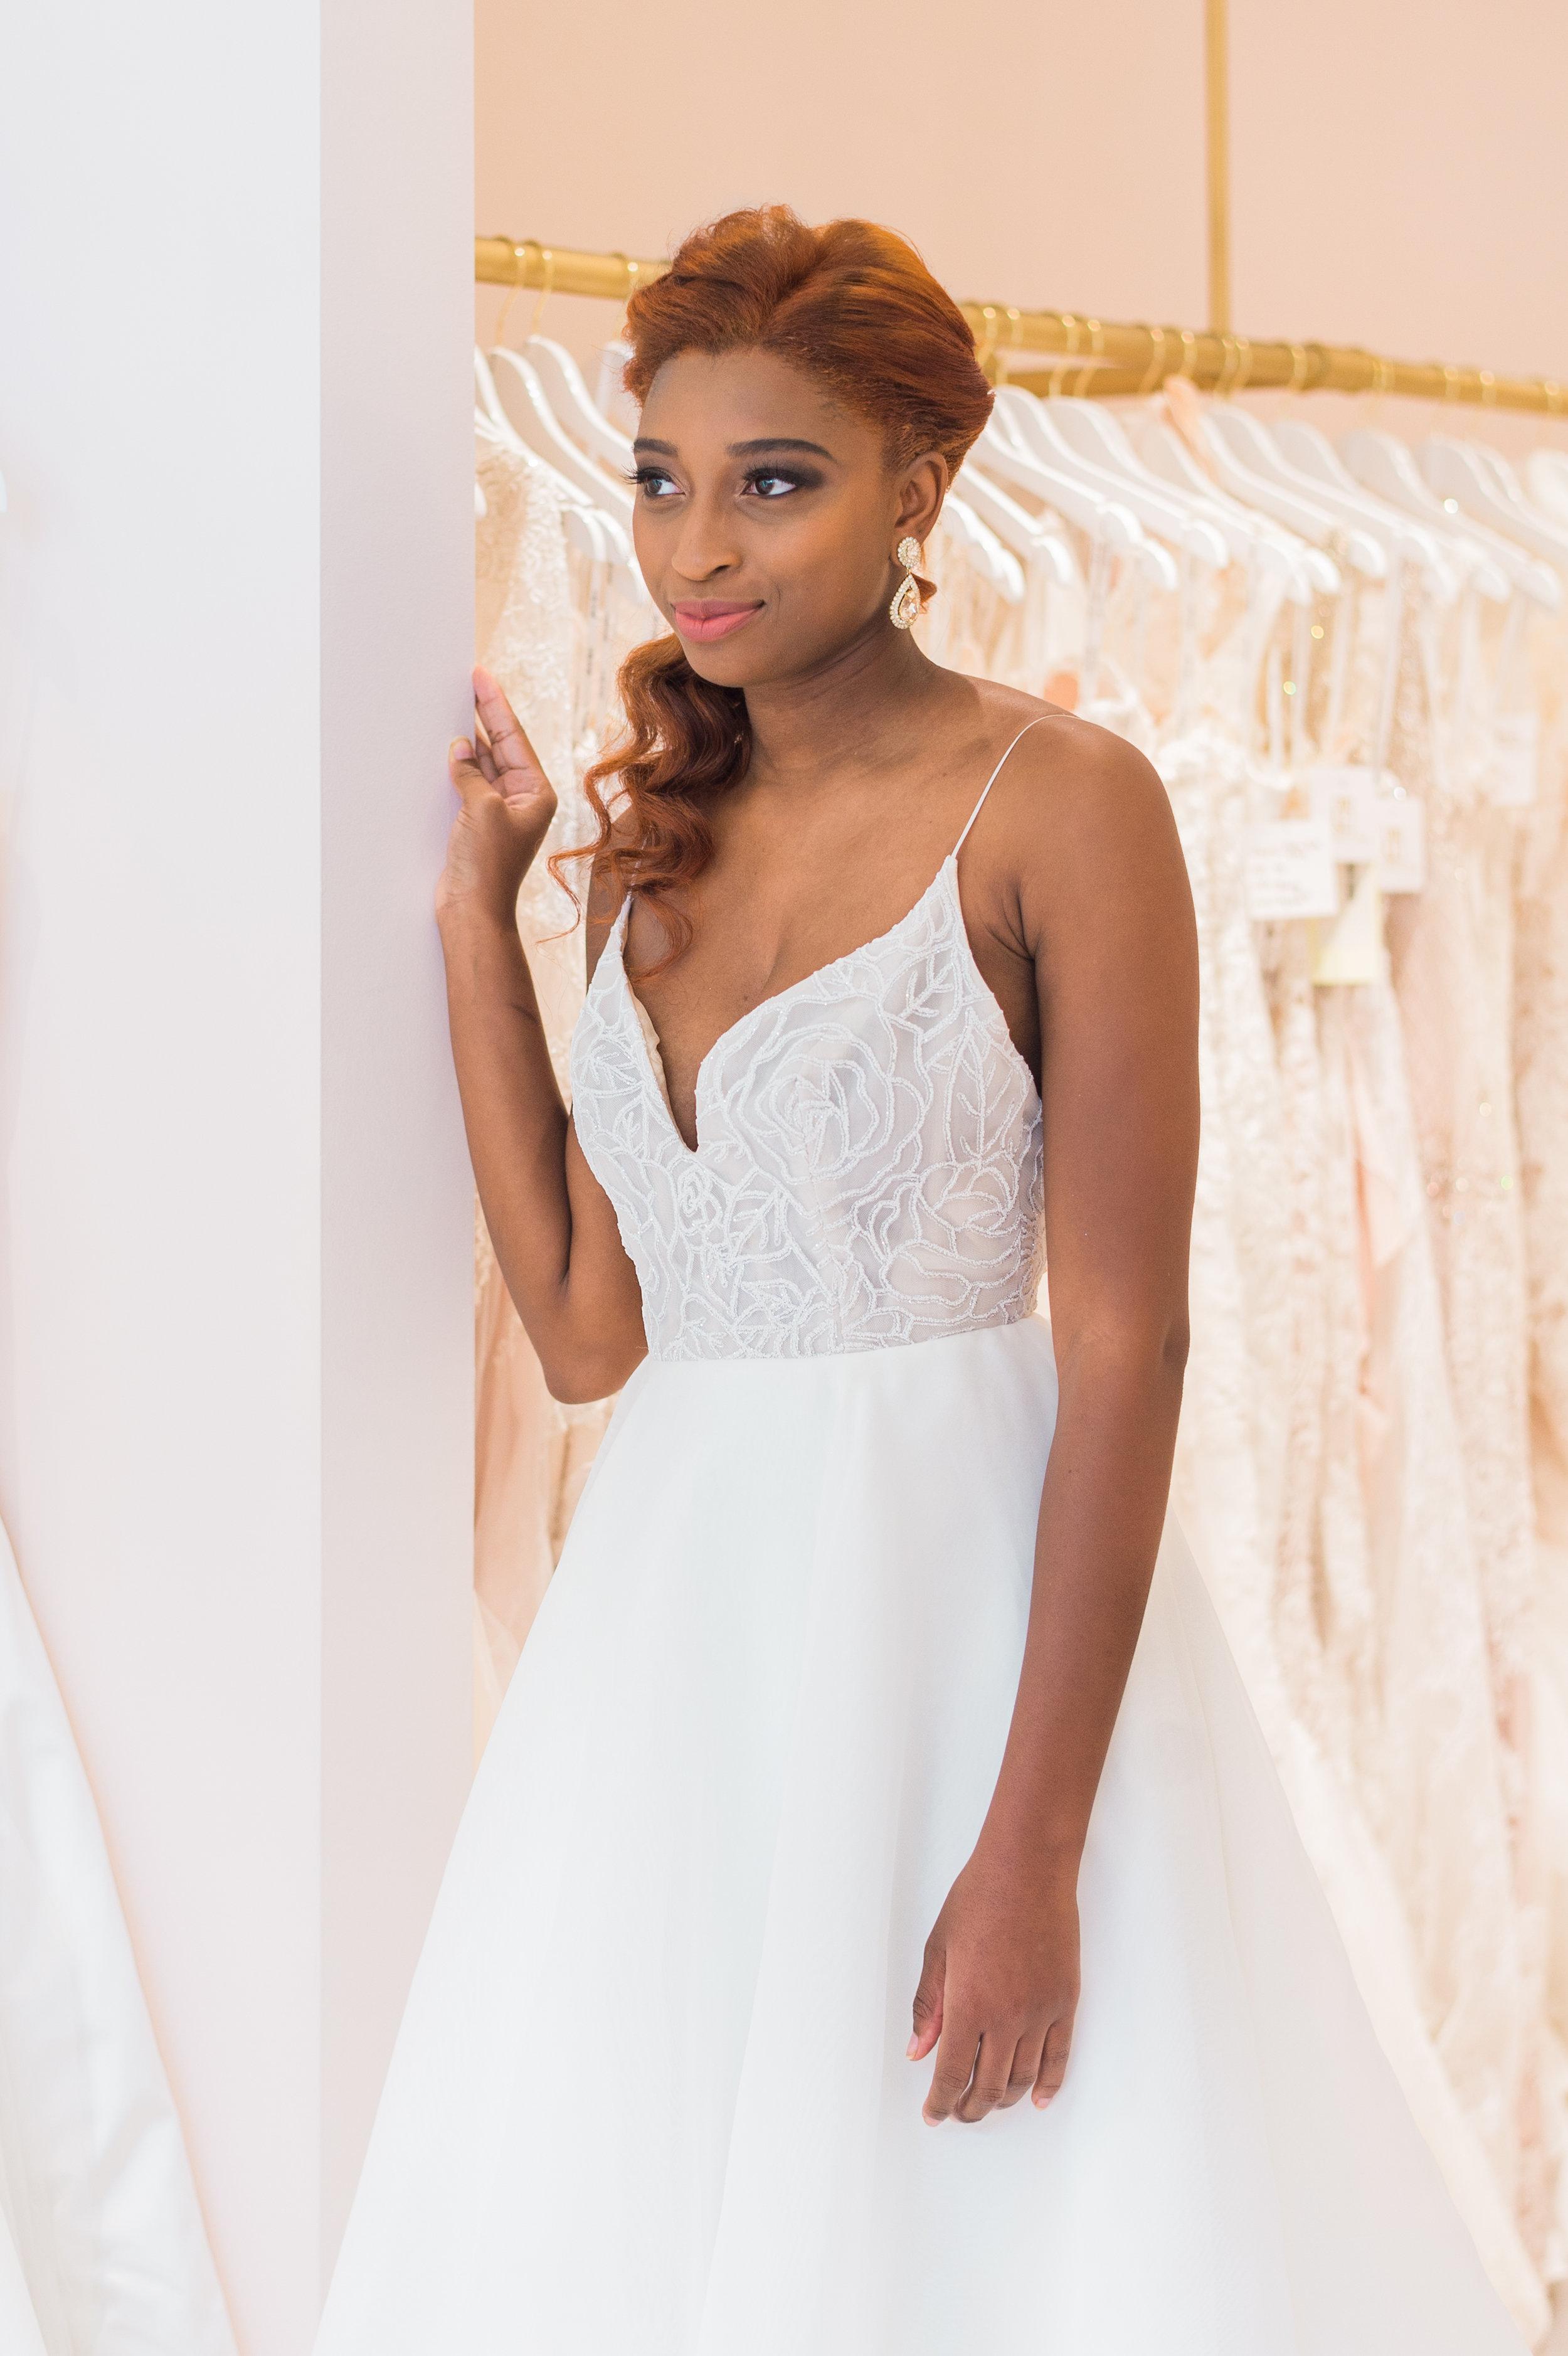 luck love photography - northern virginia wedding photographer - the bridal room va - the dresses-40.jpg